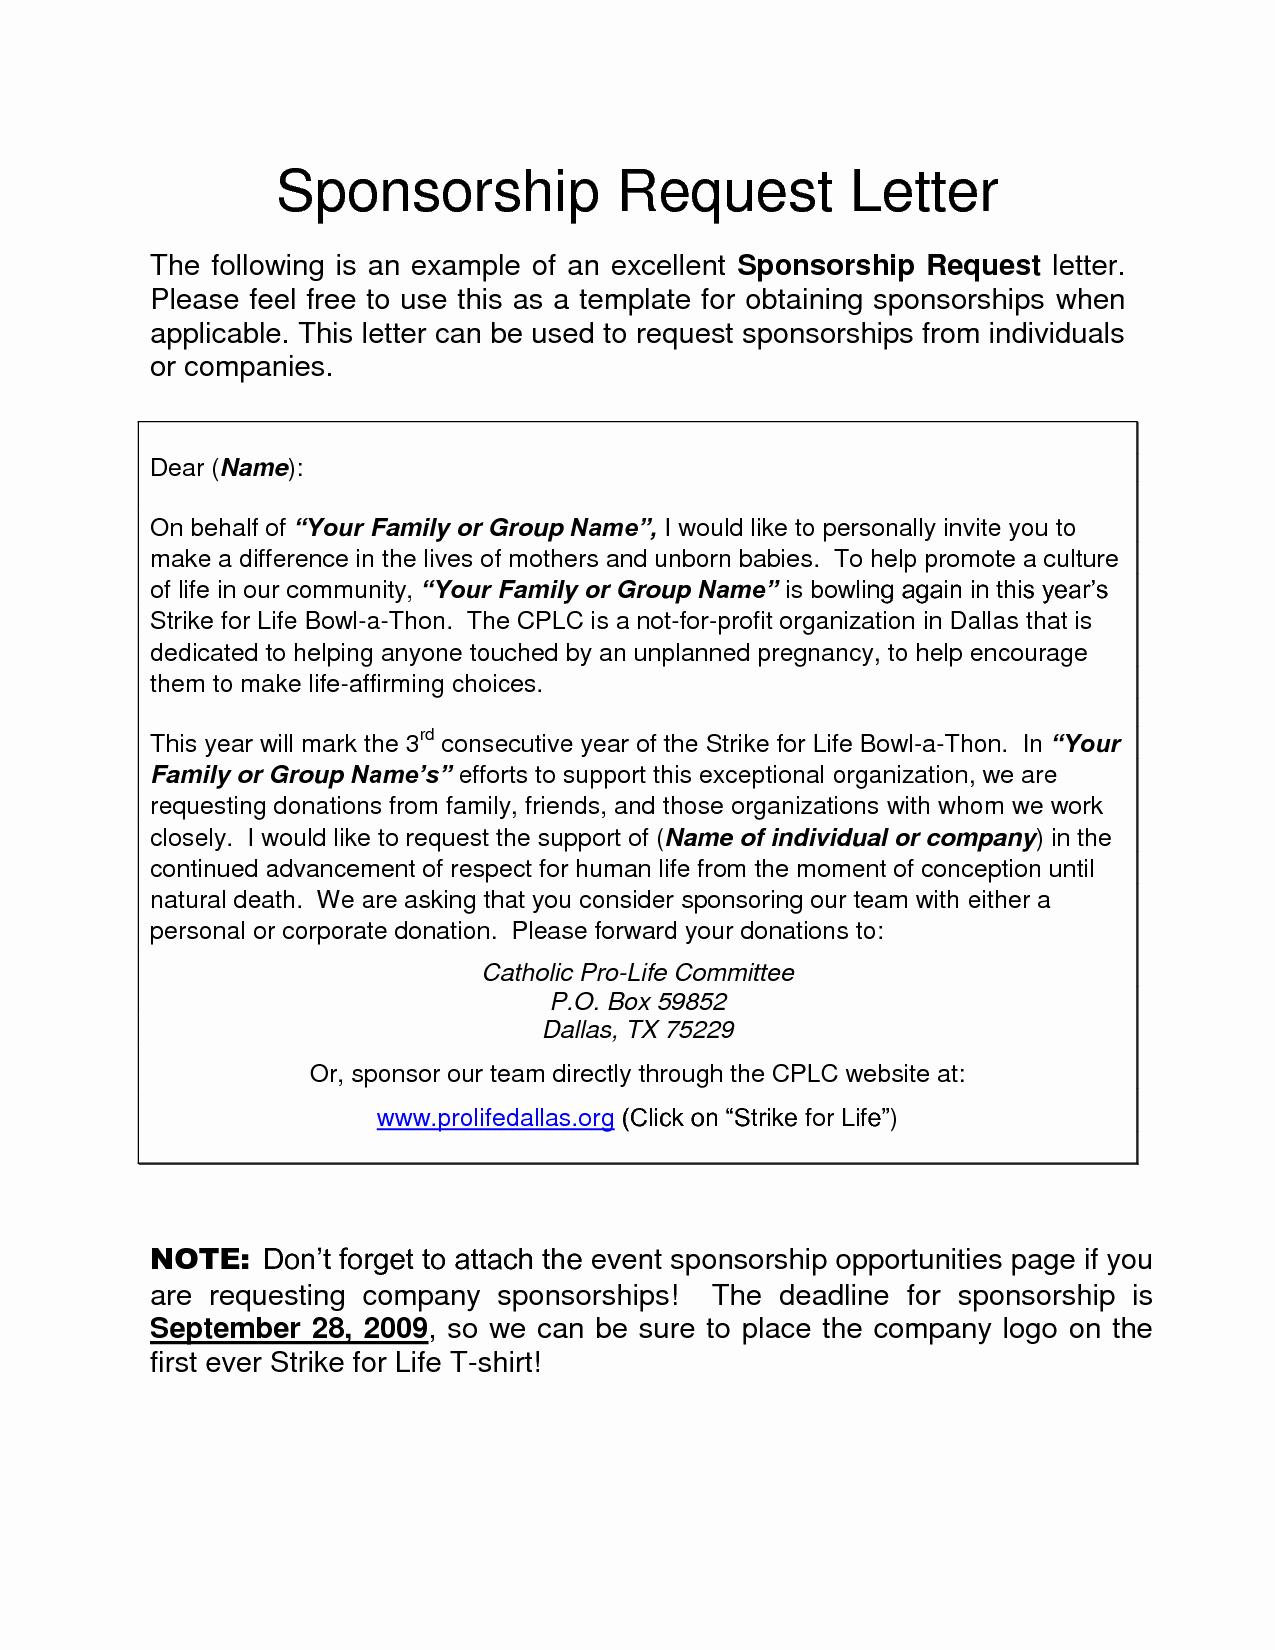 Sample Sponsorship Request Letter Inspirational Corporate Sponsorship Request Letter Charity Donation Free